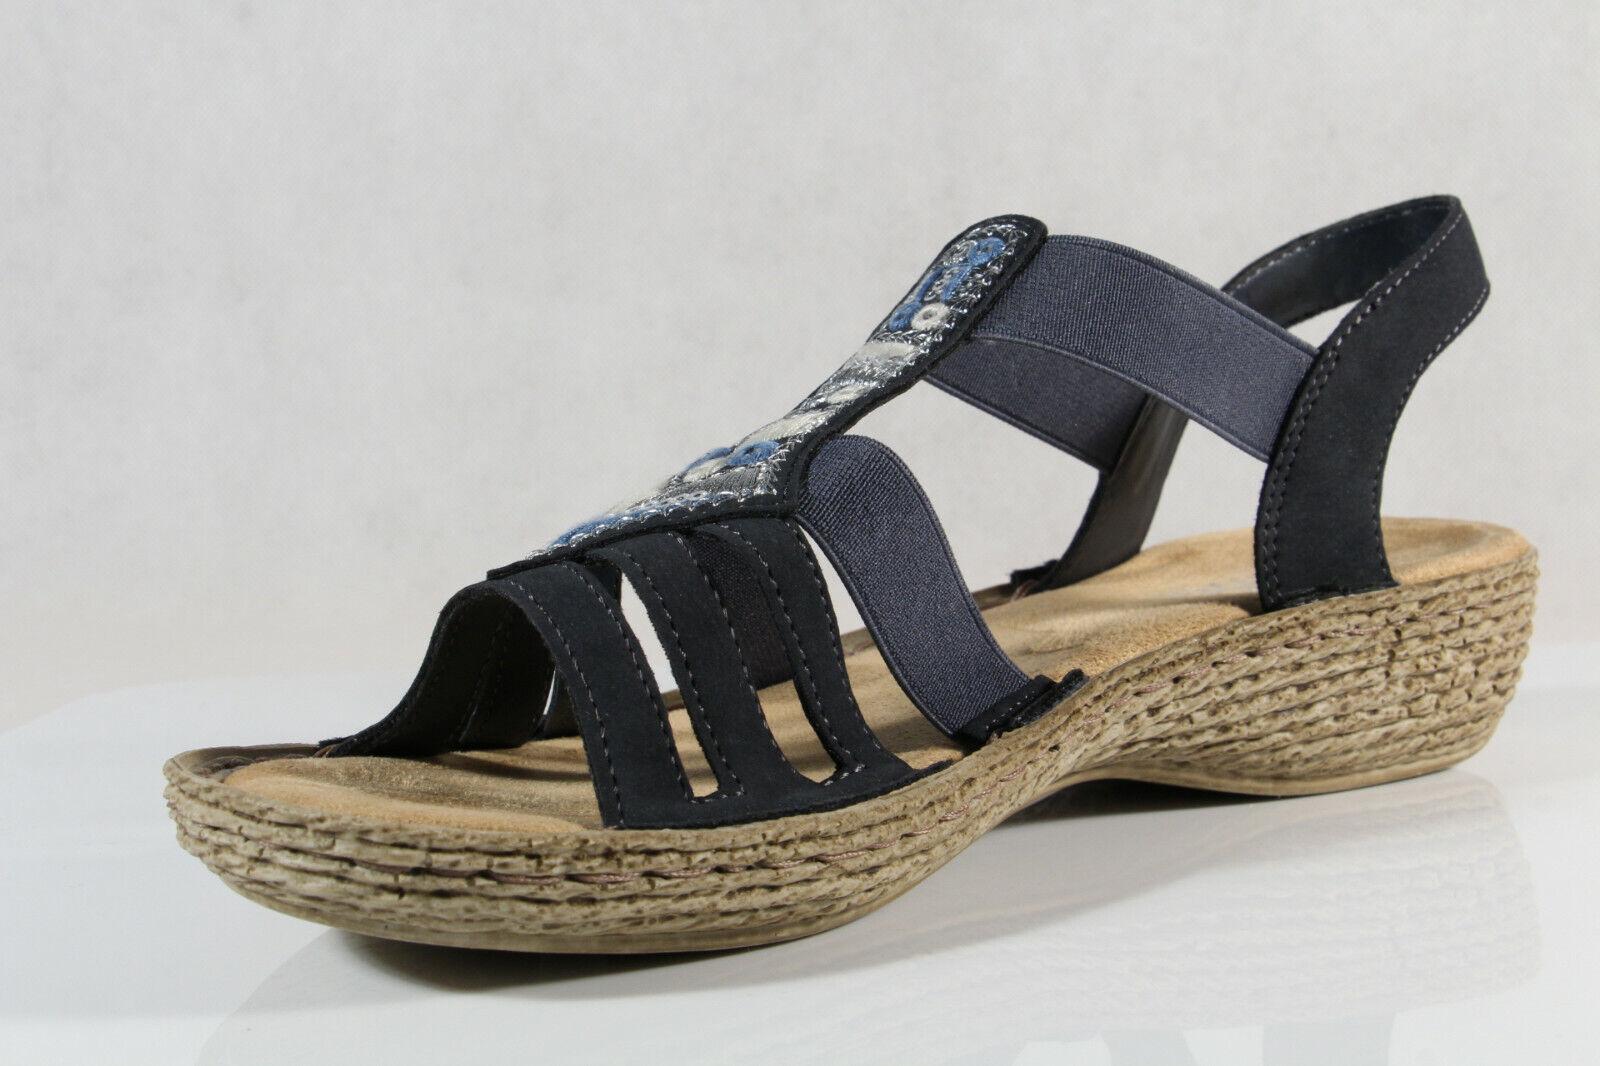 Rieker Damen Sandalen Sandaletten Sandaletten Sandaletten Sandale blau 65807 NEU   4cb7c2